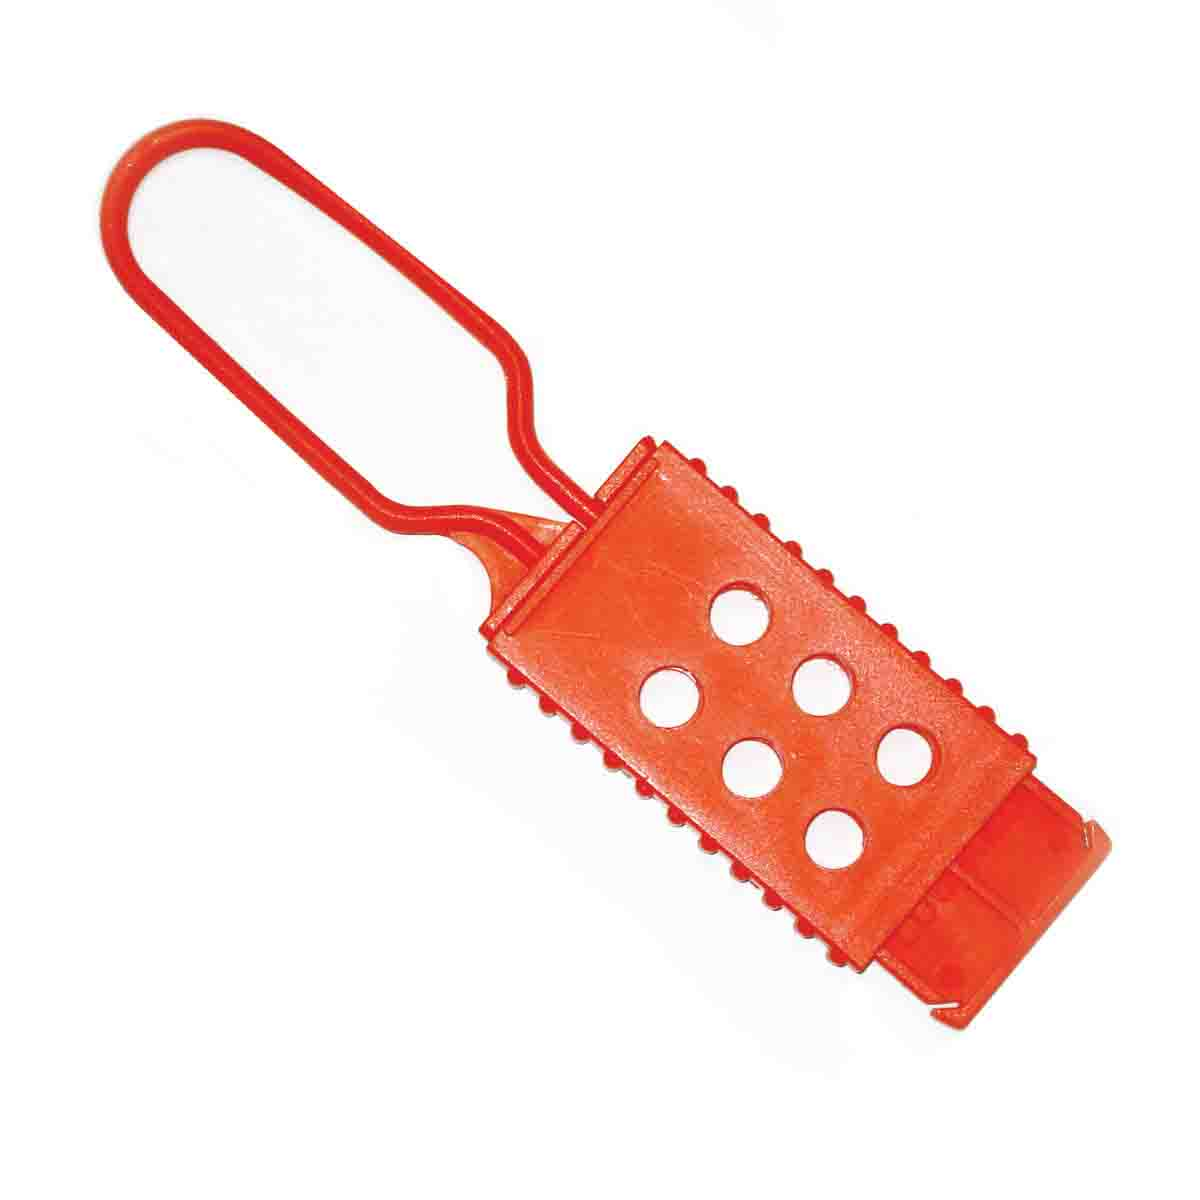 BRADY 99668 Non Conductive LockoutHasp